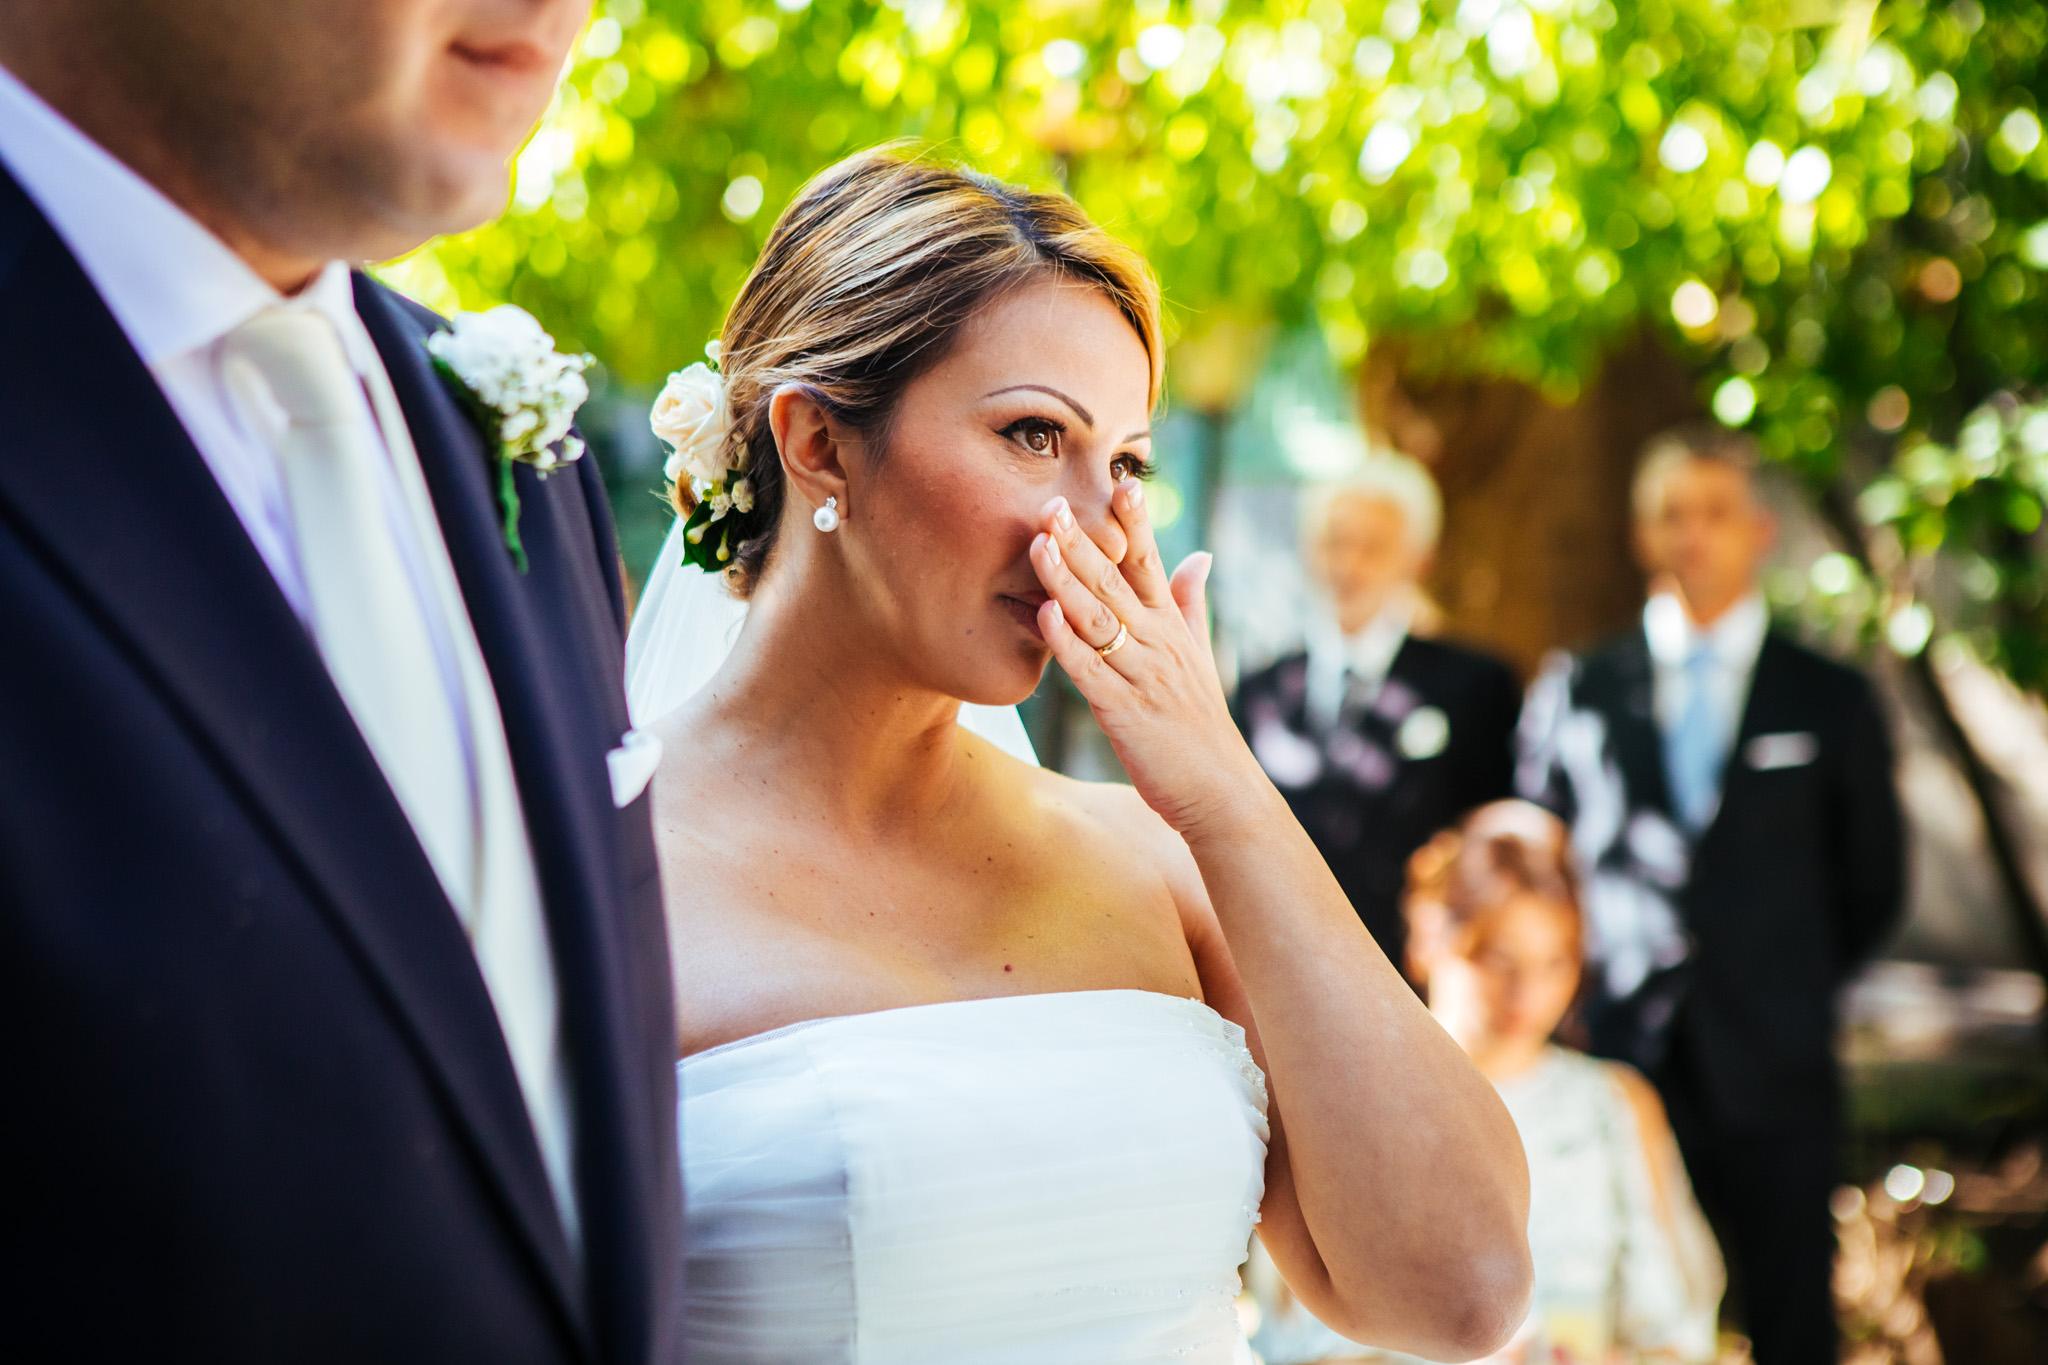 matrimonio-a-catania-28.jpg